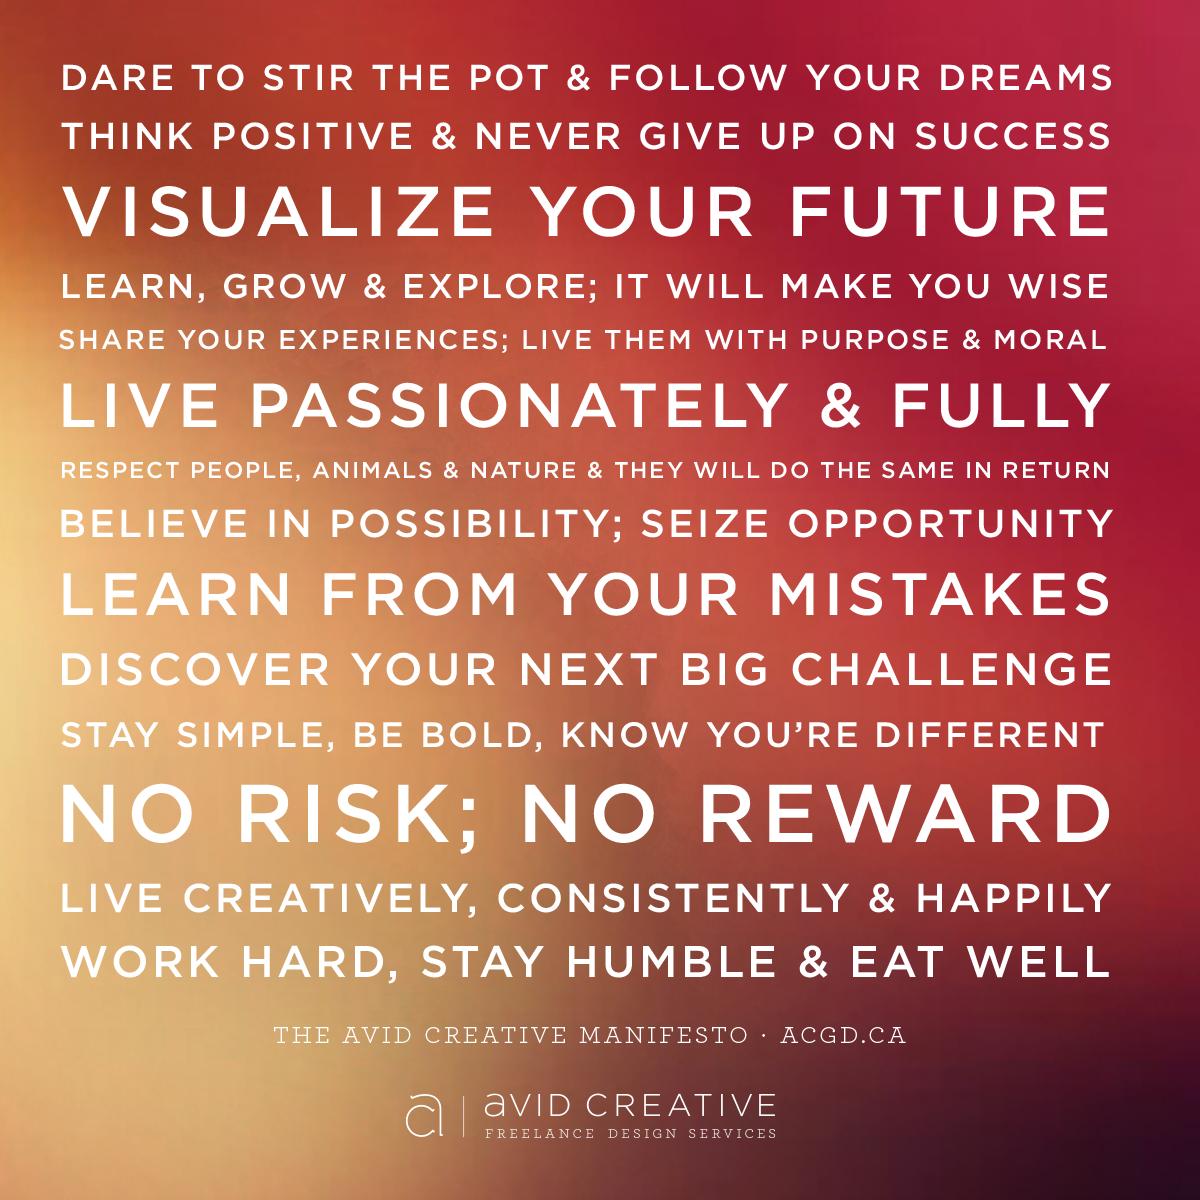 The Avid Creative Manifesto